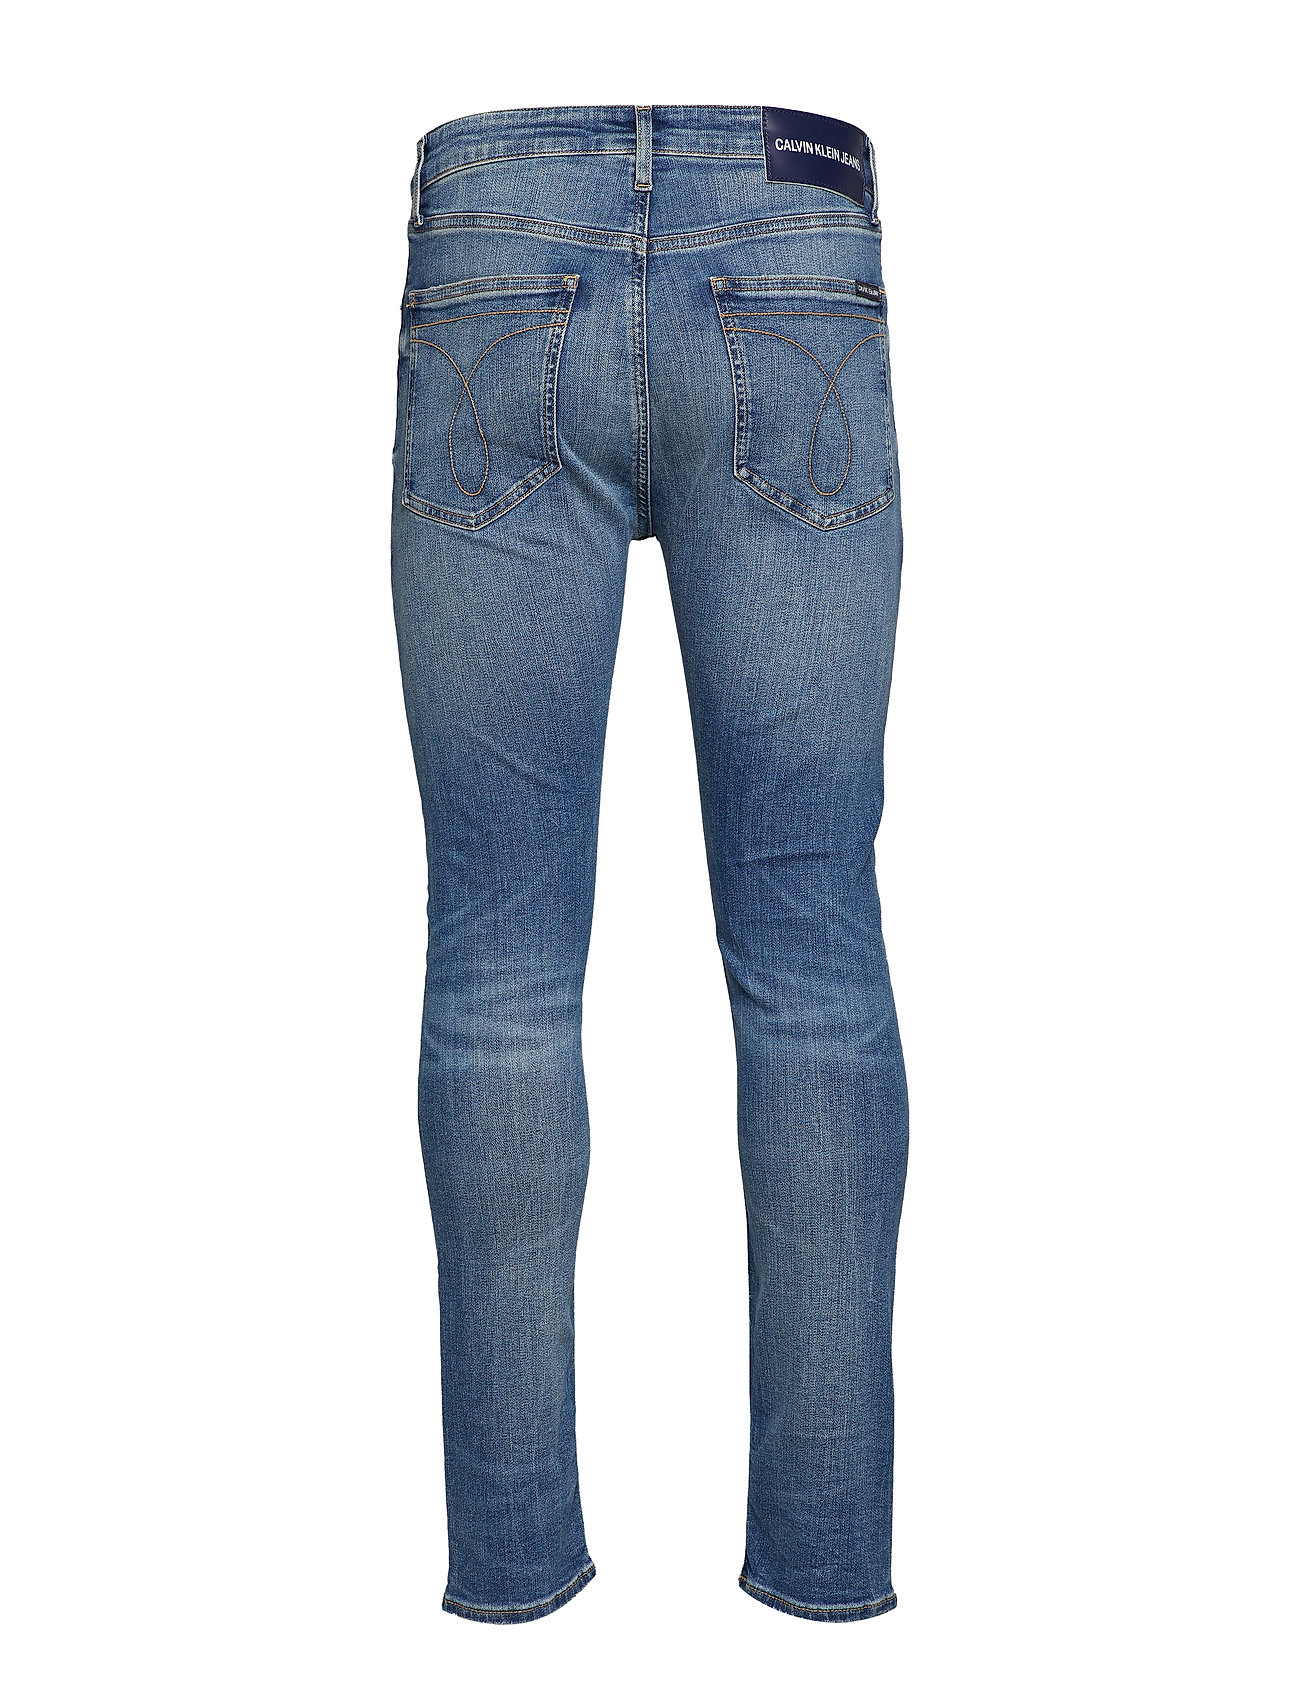 016 Jeans BlueCalvin Ckj Skinnyba124 Mid Klein jSMVUzqLpG